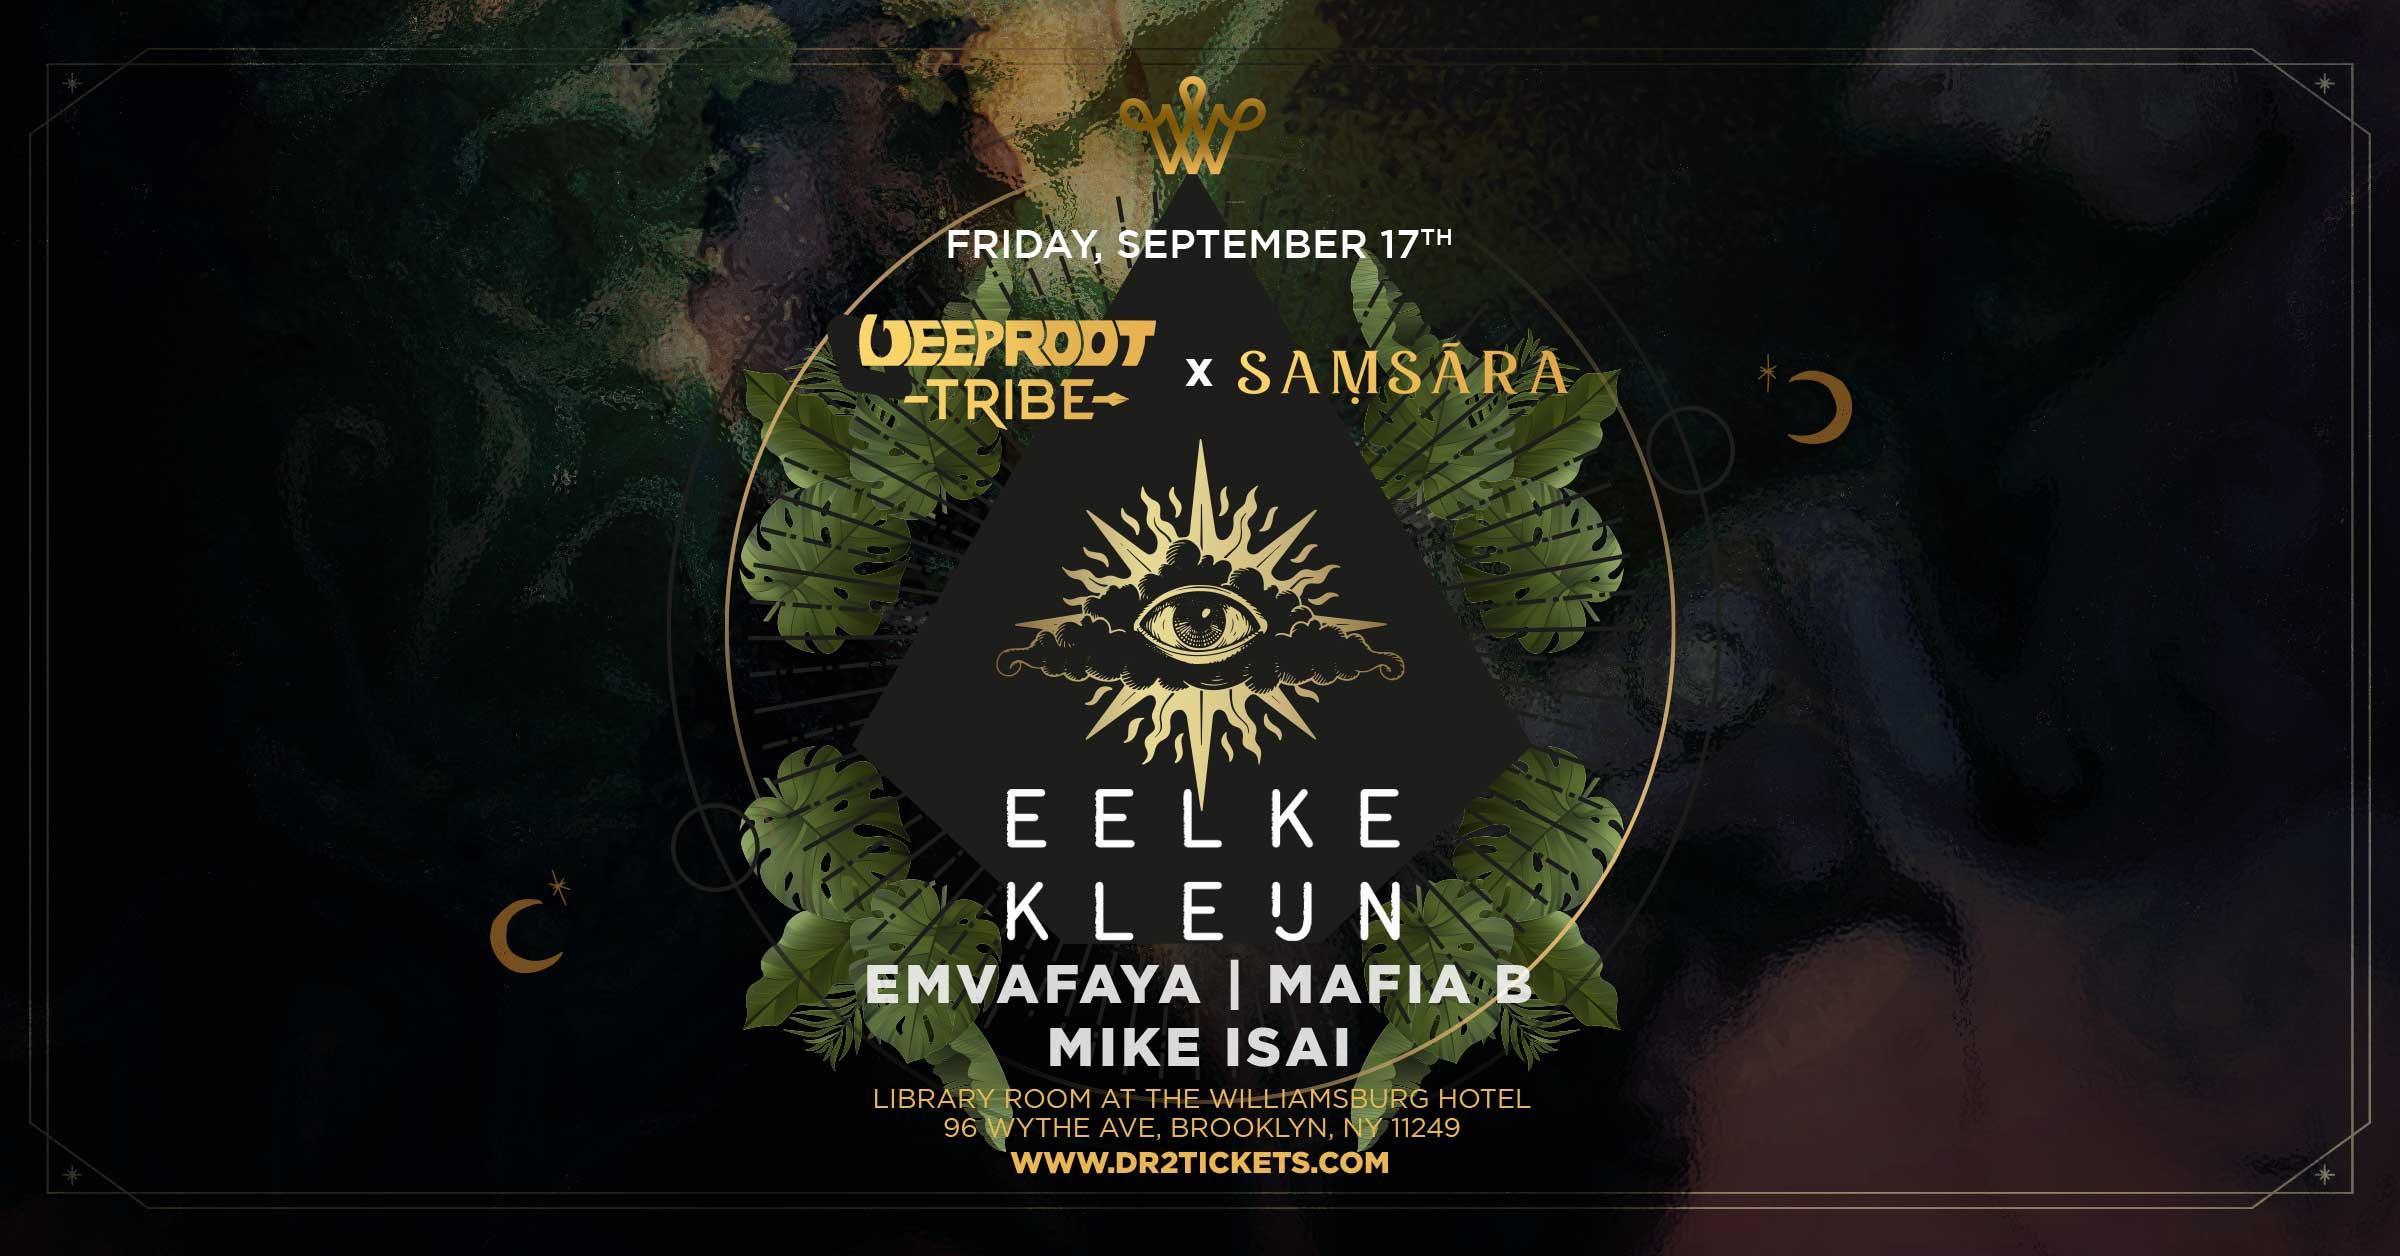 Deep Root Tribe & Samsara Present Eelke Kleijn In The Library Room At The Williamsburg Hotel